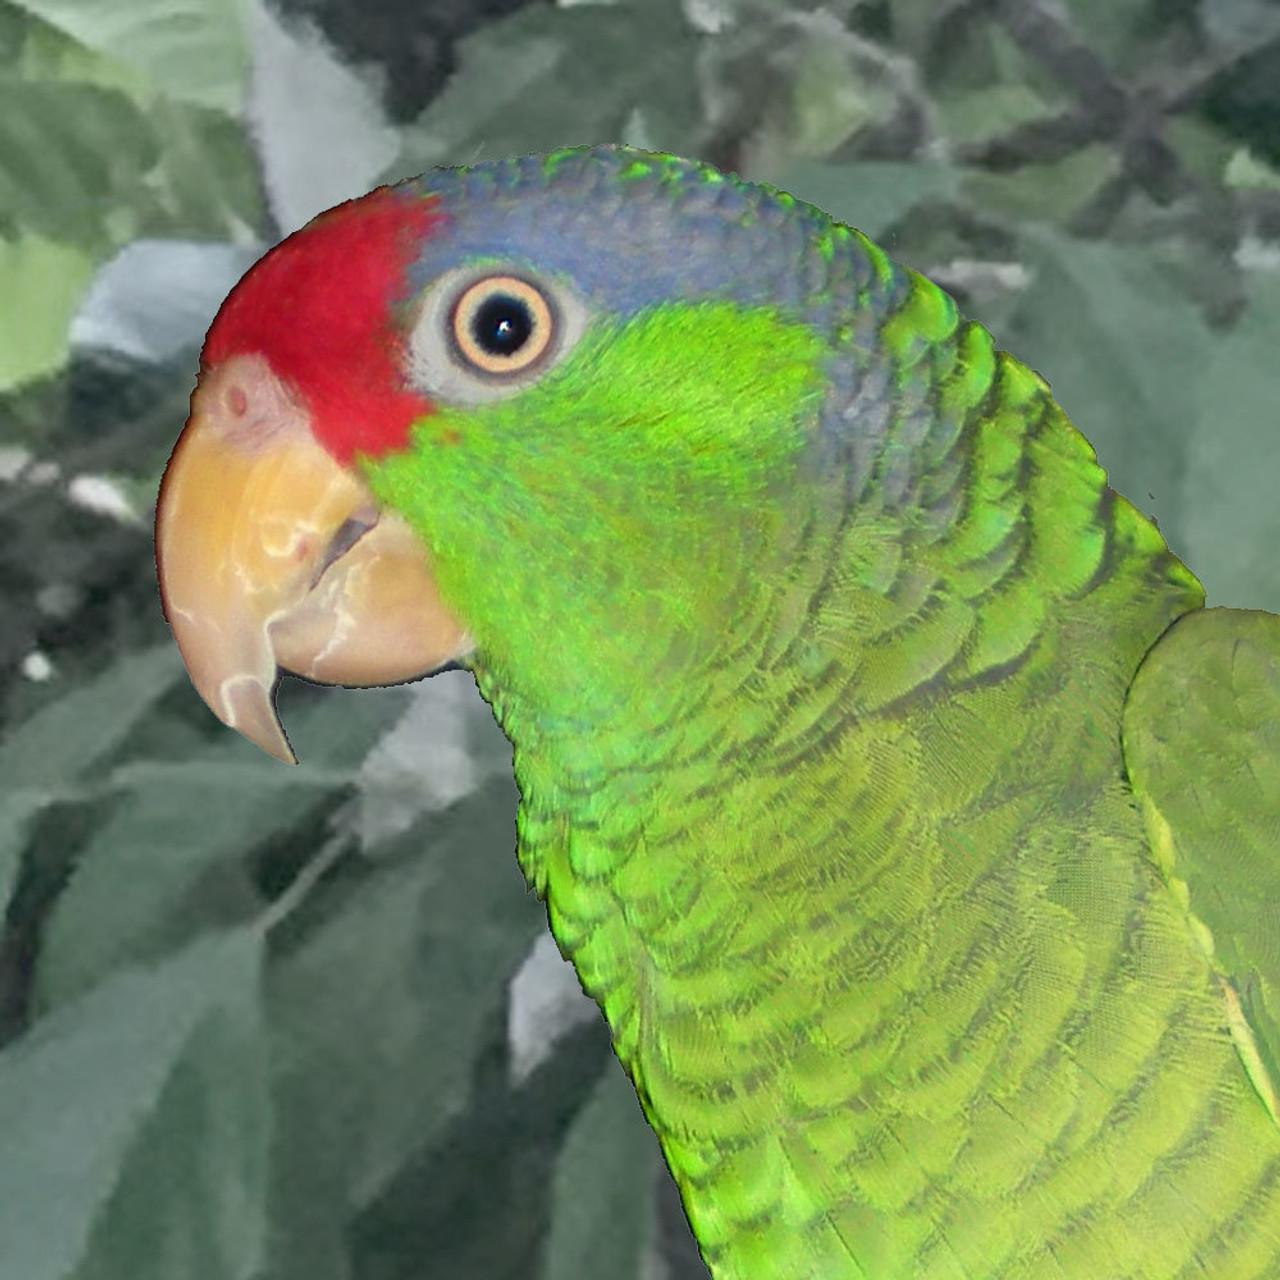 BIRDS & PARROTS - BIRDS by Species - Amazon Parrots